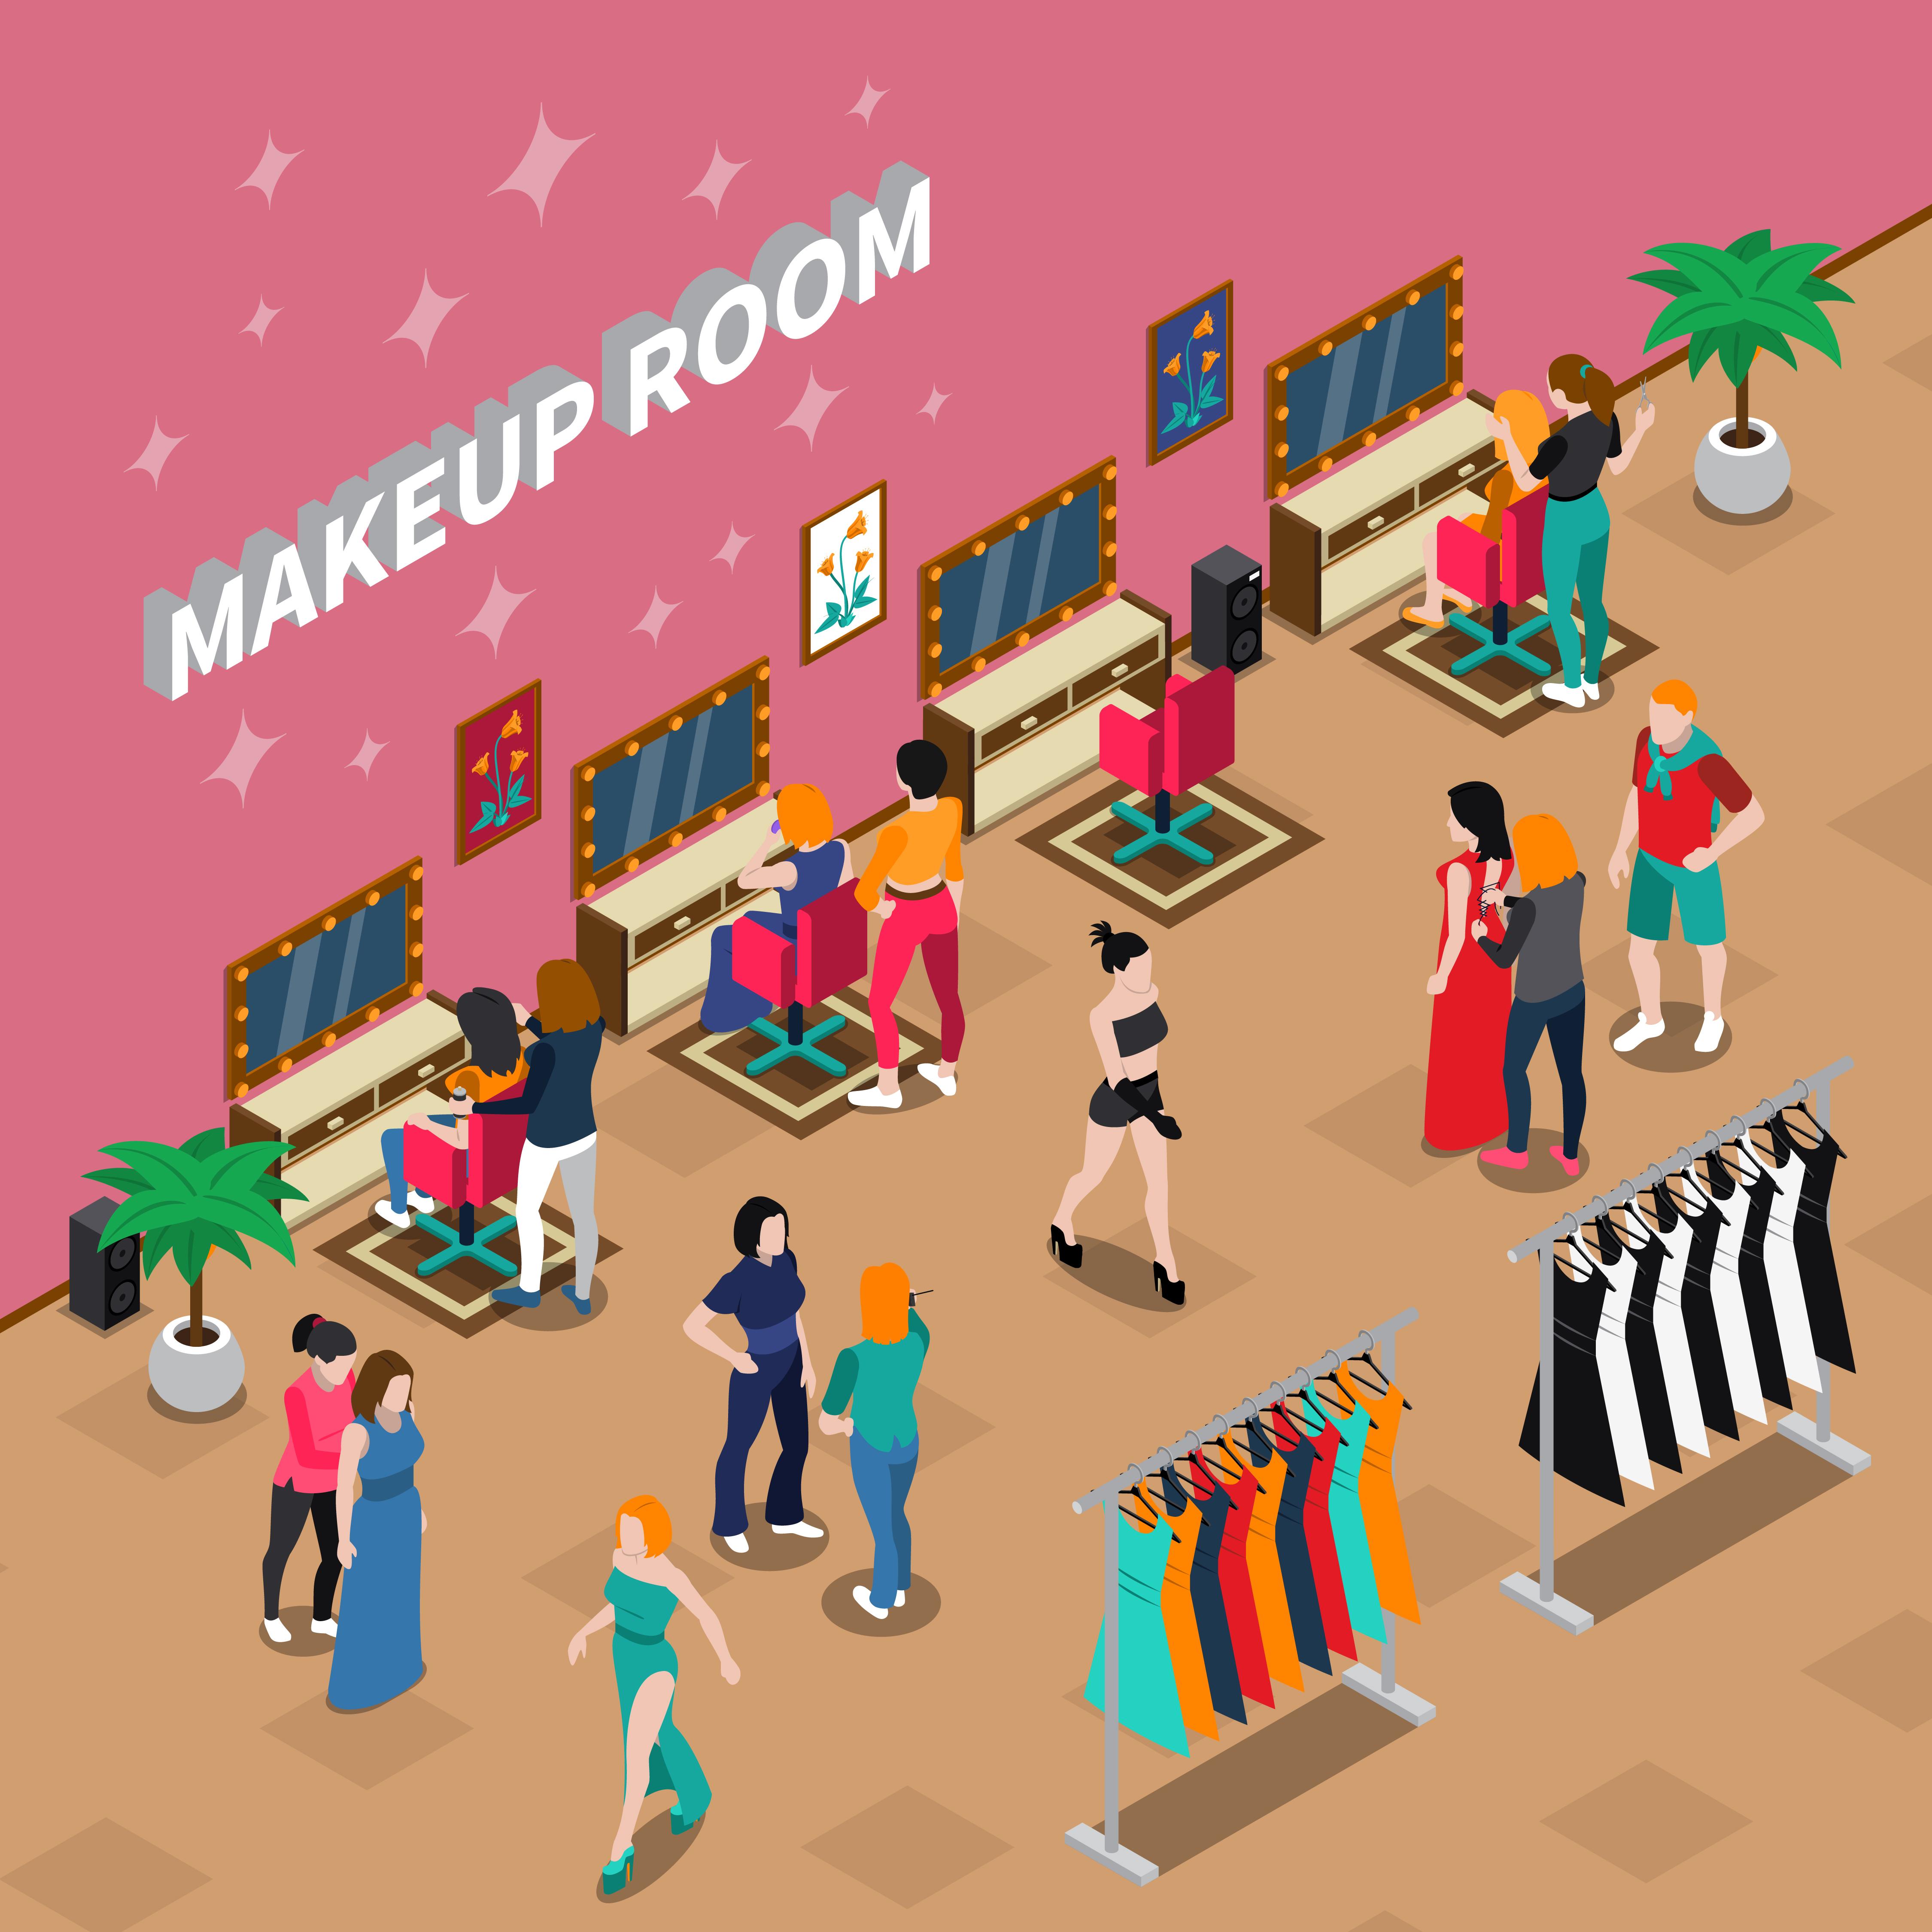 Makeup Room Fashion Industry Isometric Illustration